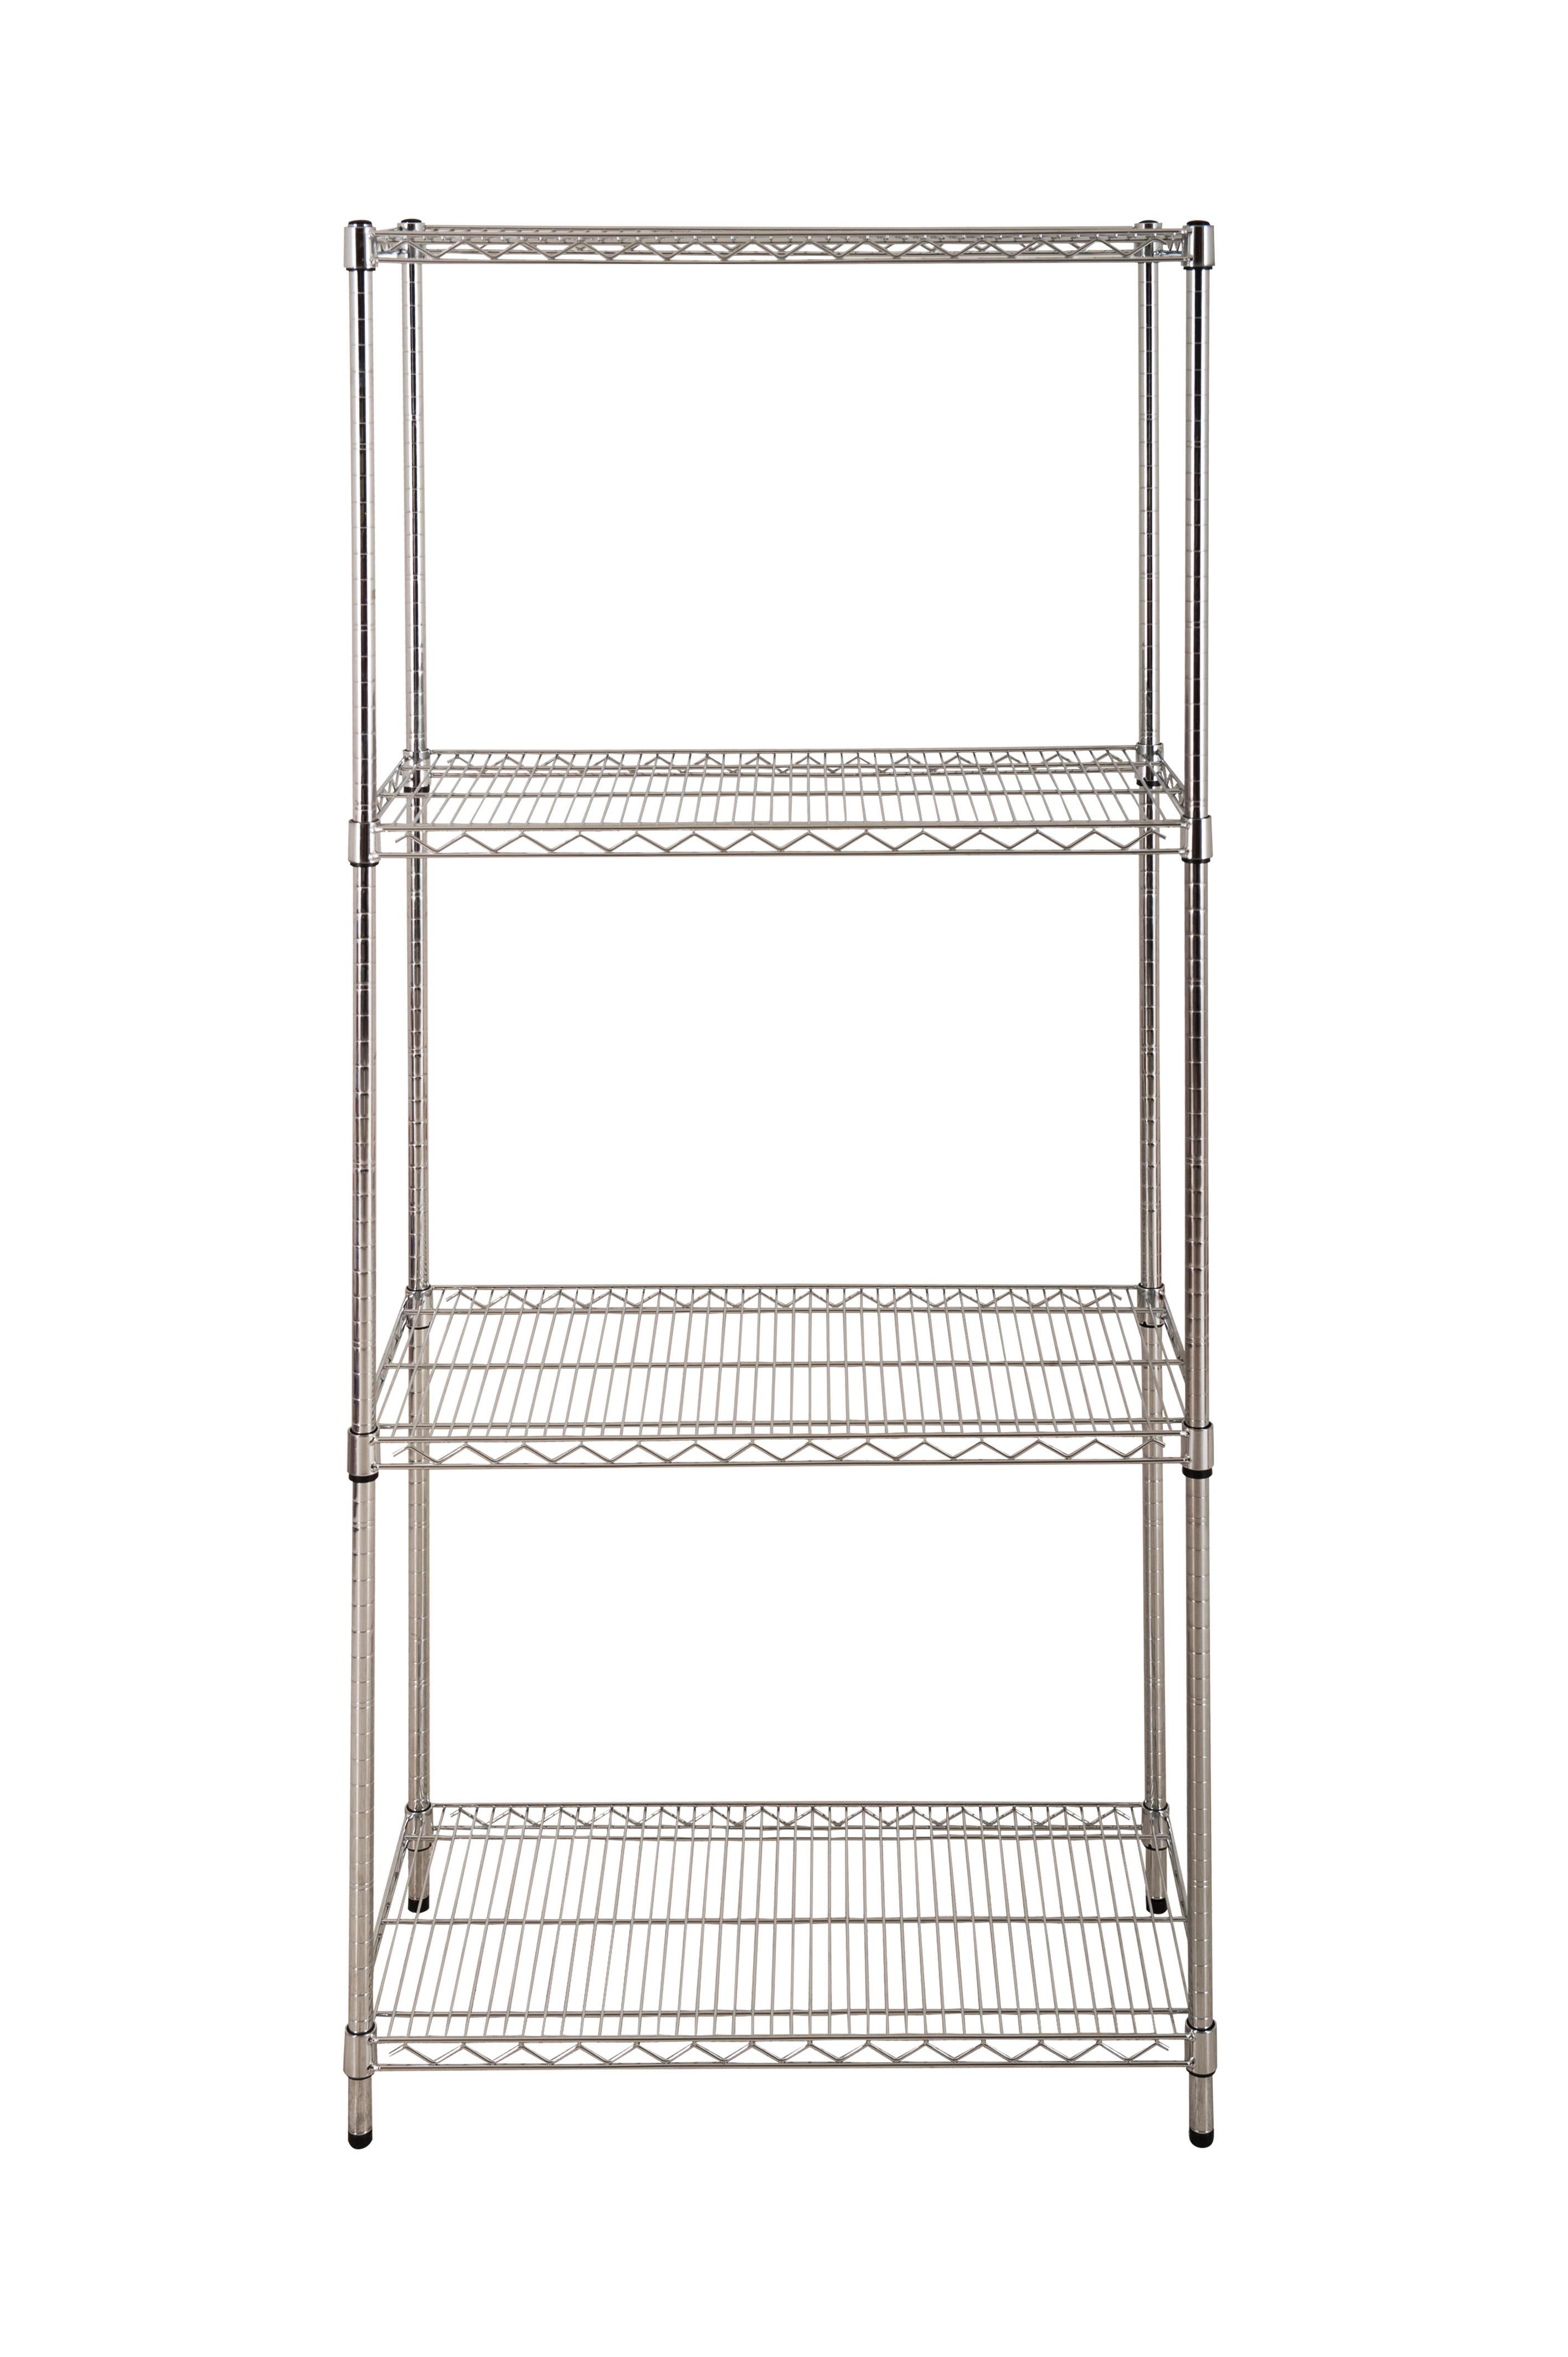 4 Shelf Chrome Starter Bay - 1880 x 915 x 610